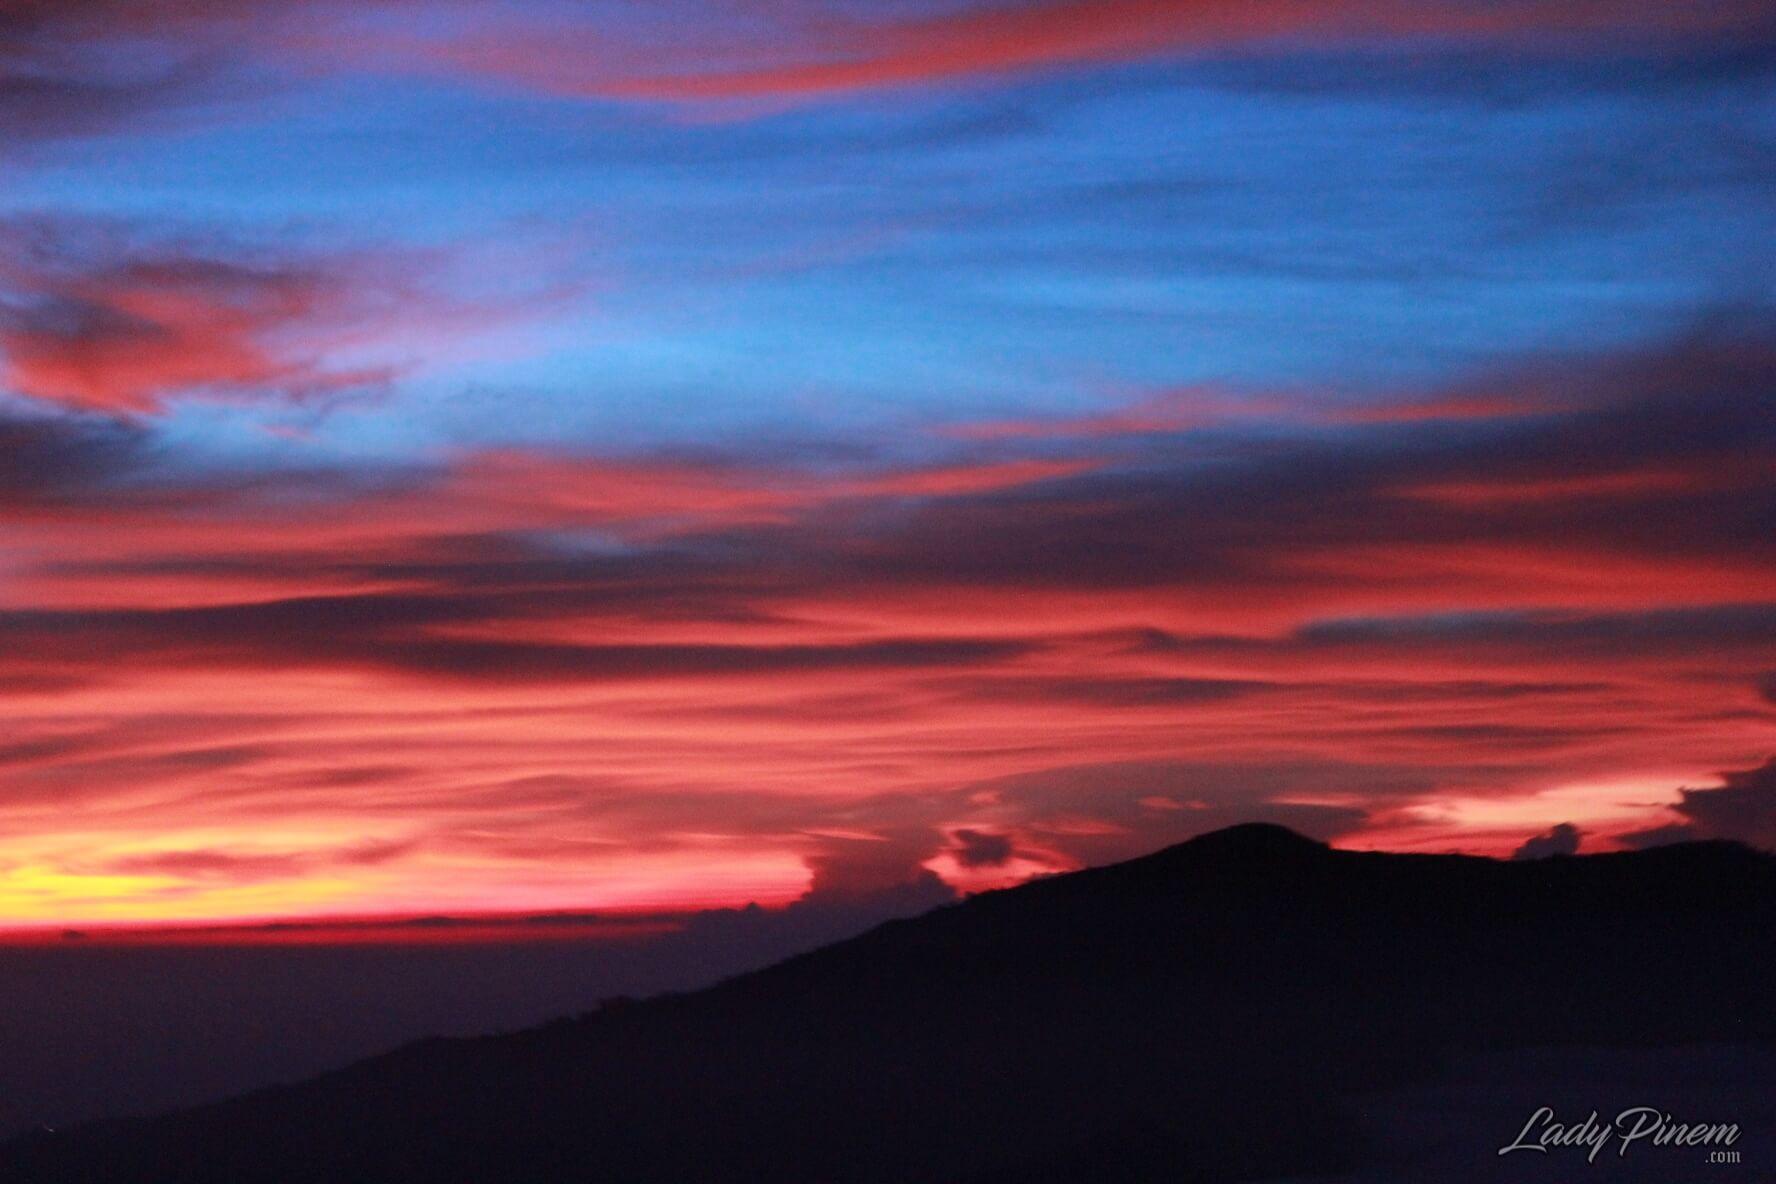 Panduan Taman Nasional Bromo Tengger Semeru 5